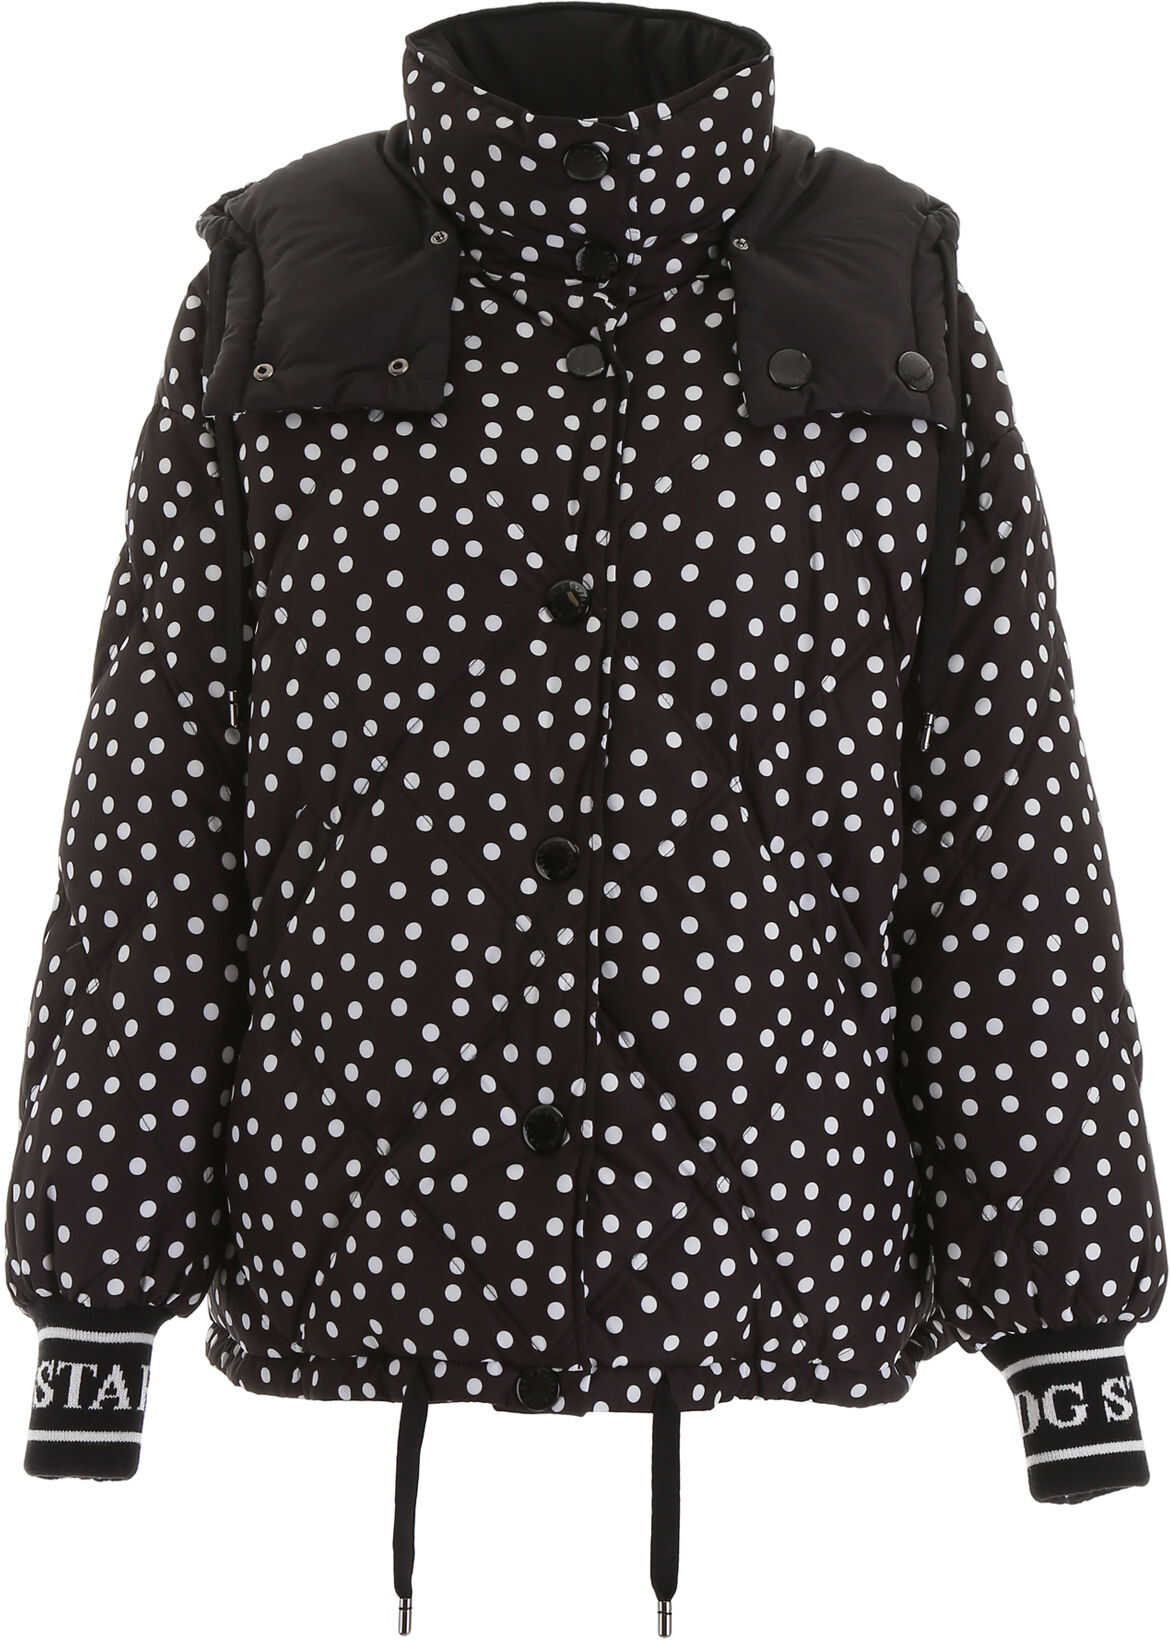 Dolce & Gabbana Reversible Puffer Jacket VARIANTE ABBINATA